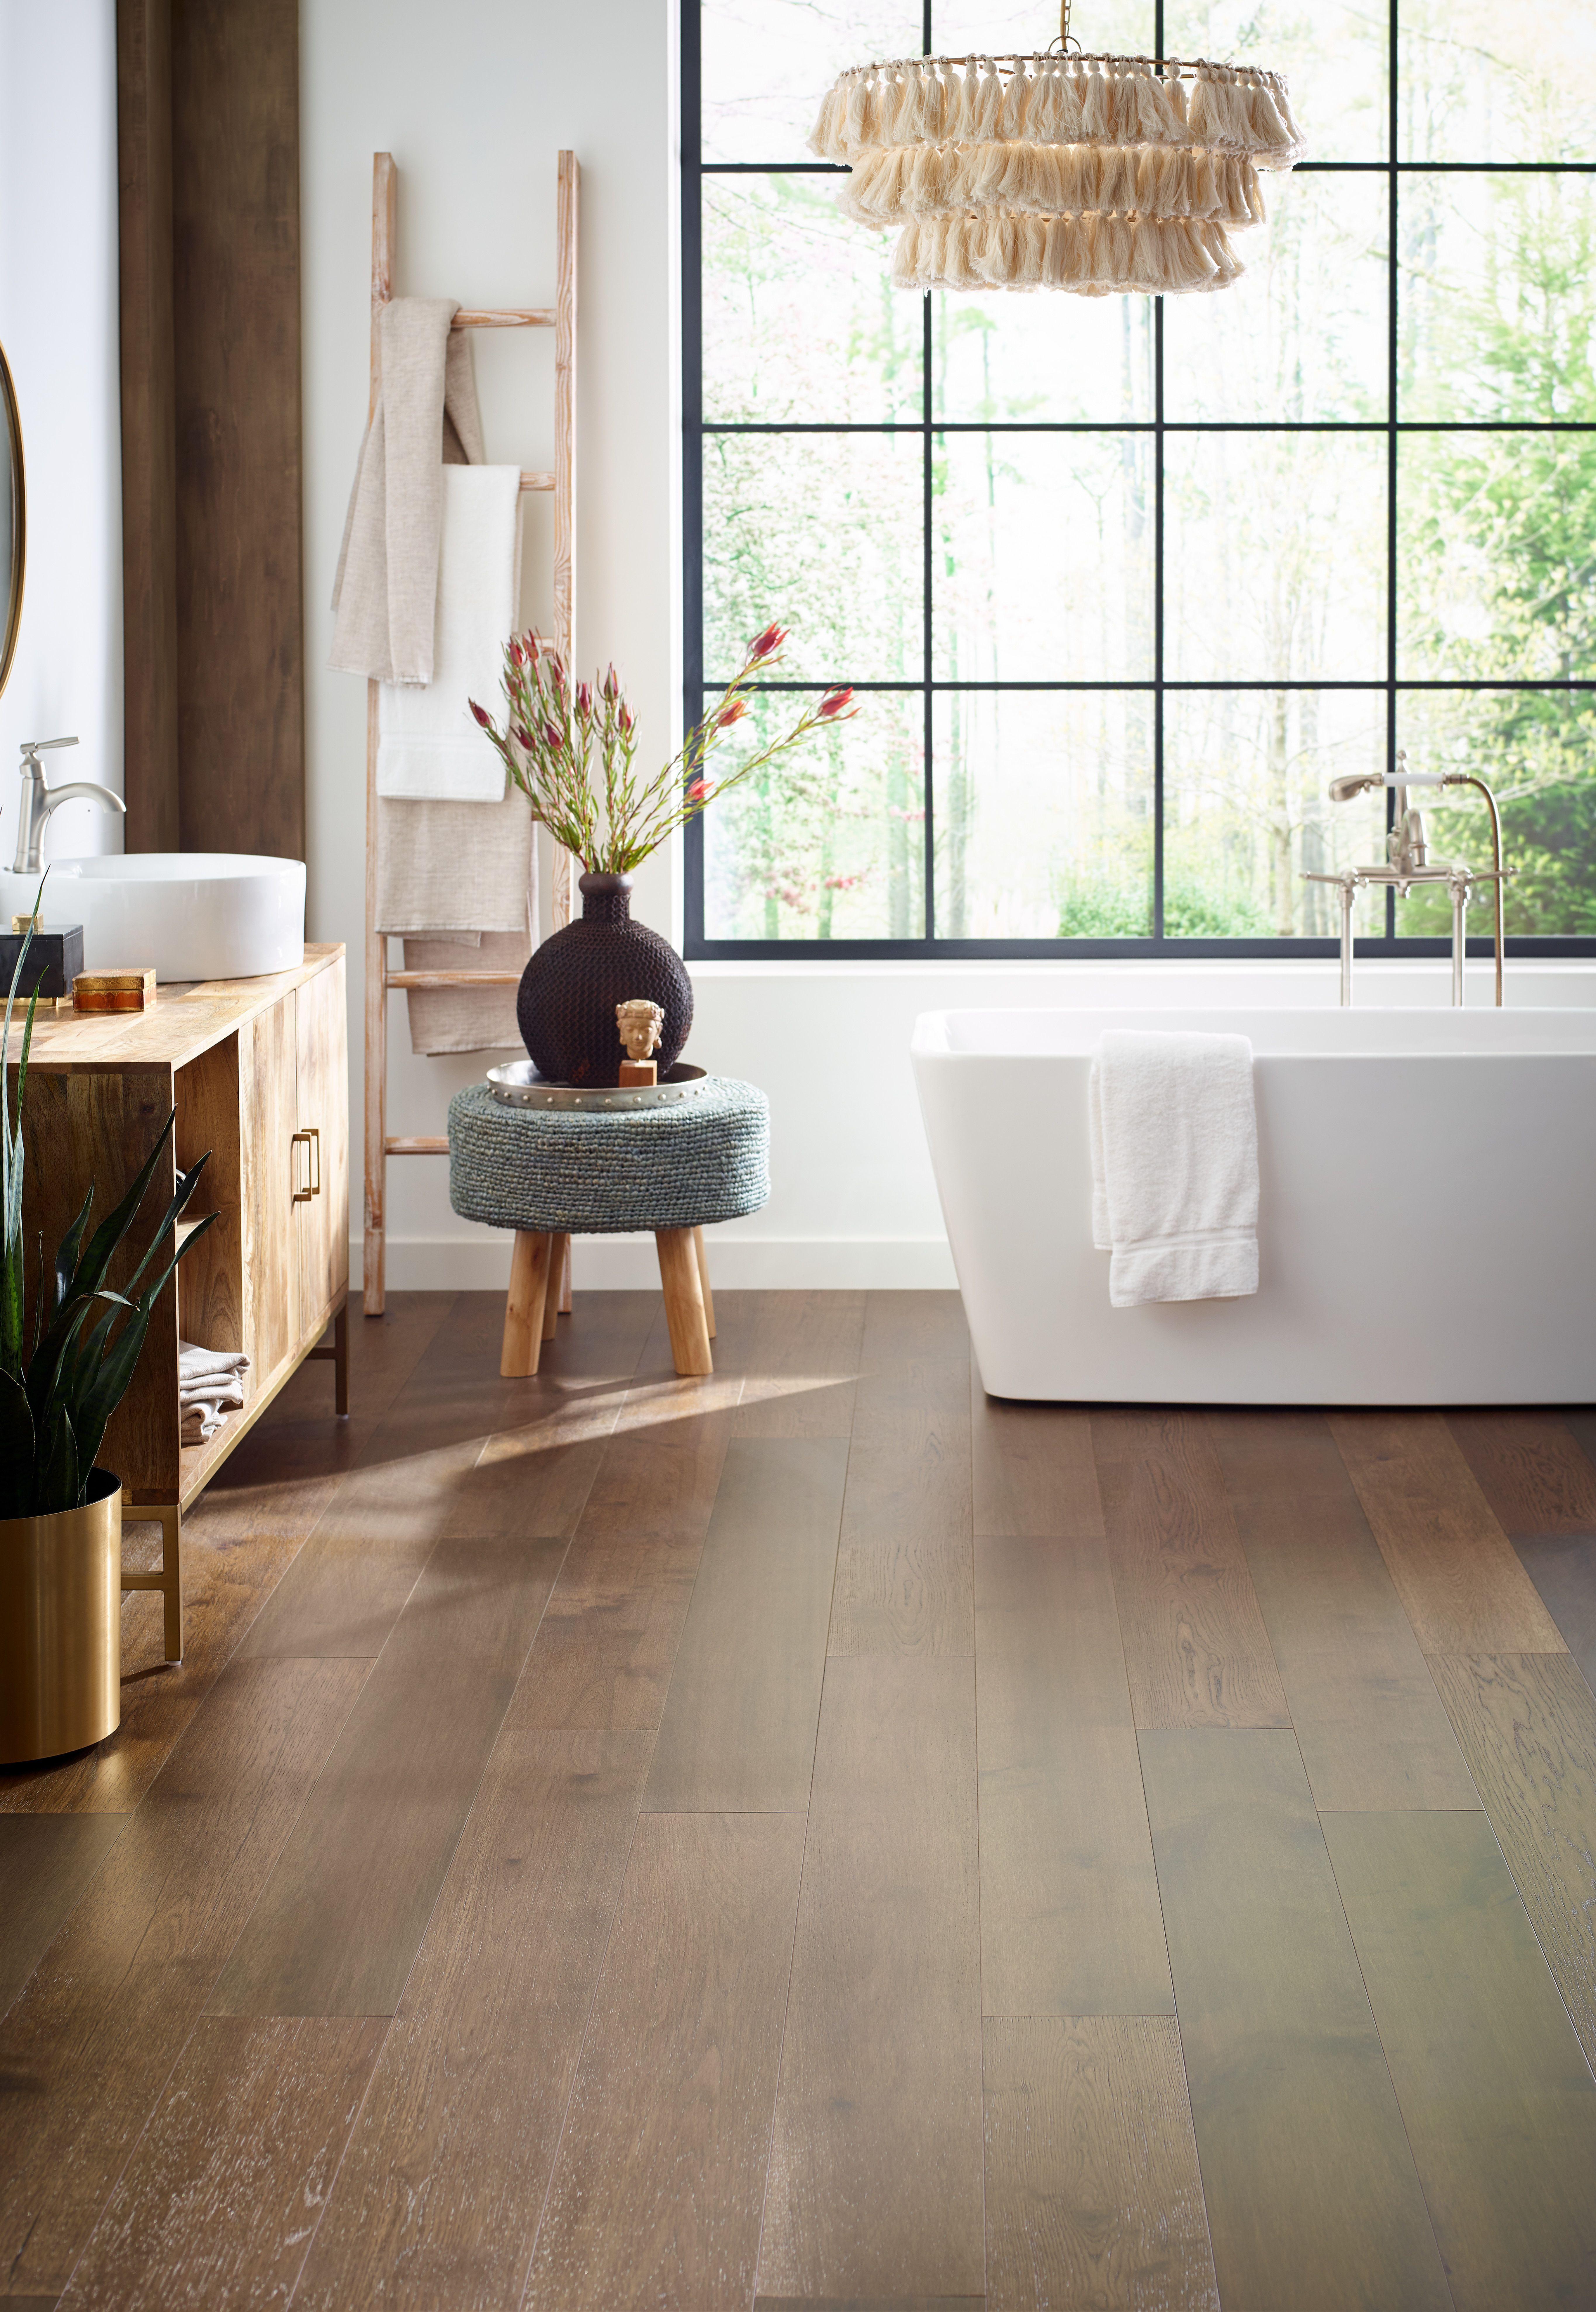 Boho Chic Bathroom Bathroom Bohochic In 2020 Flooring Chic Bathrooms Wood Floor Colors